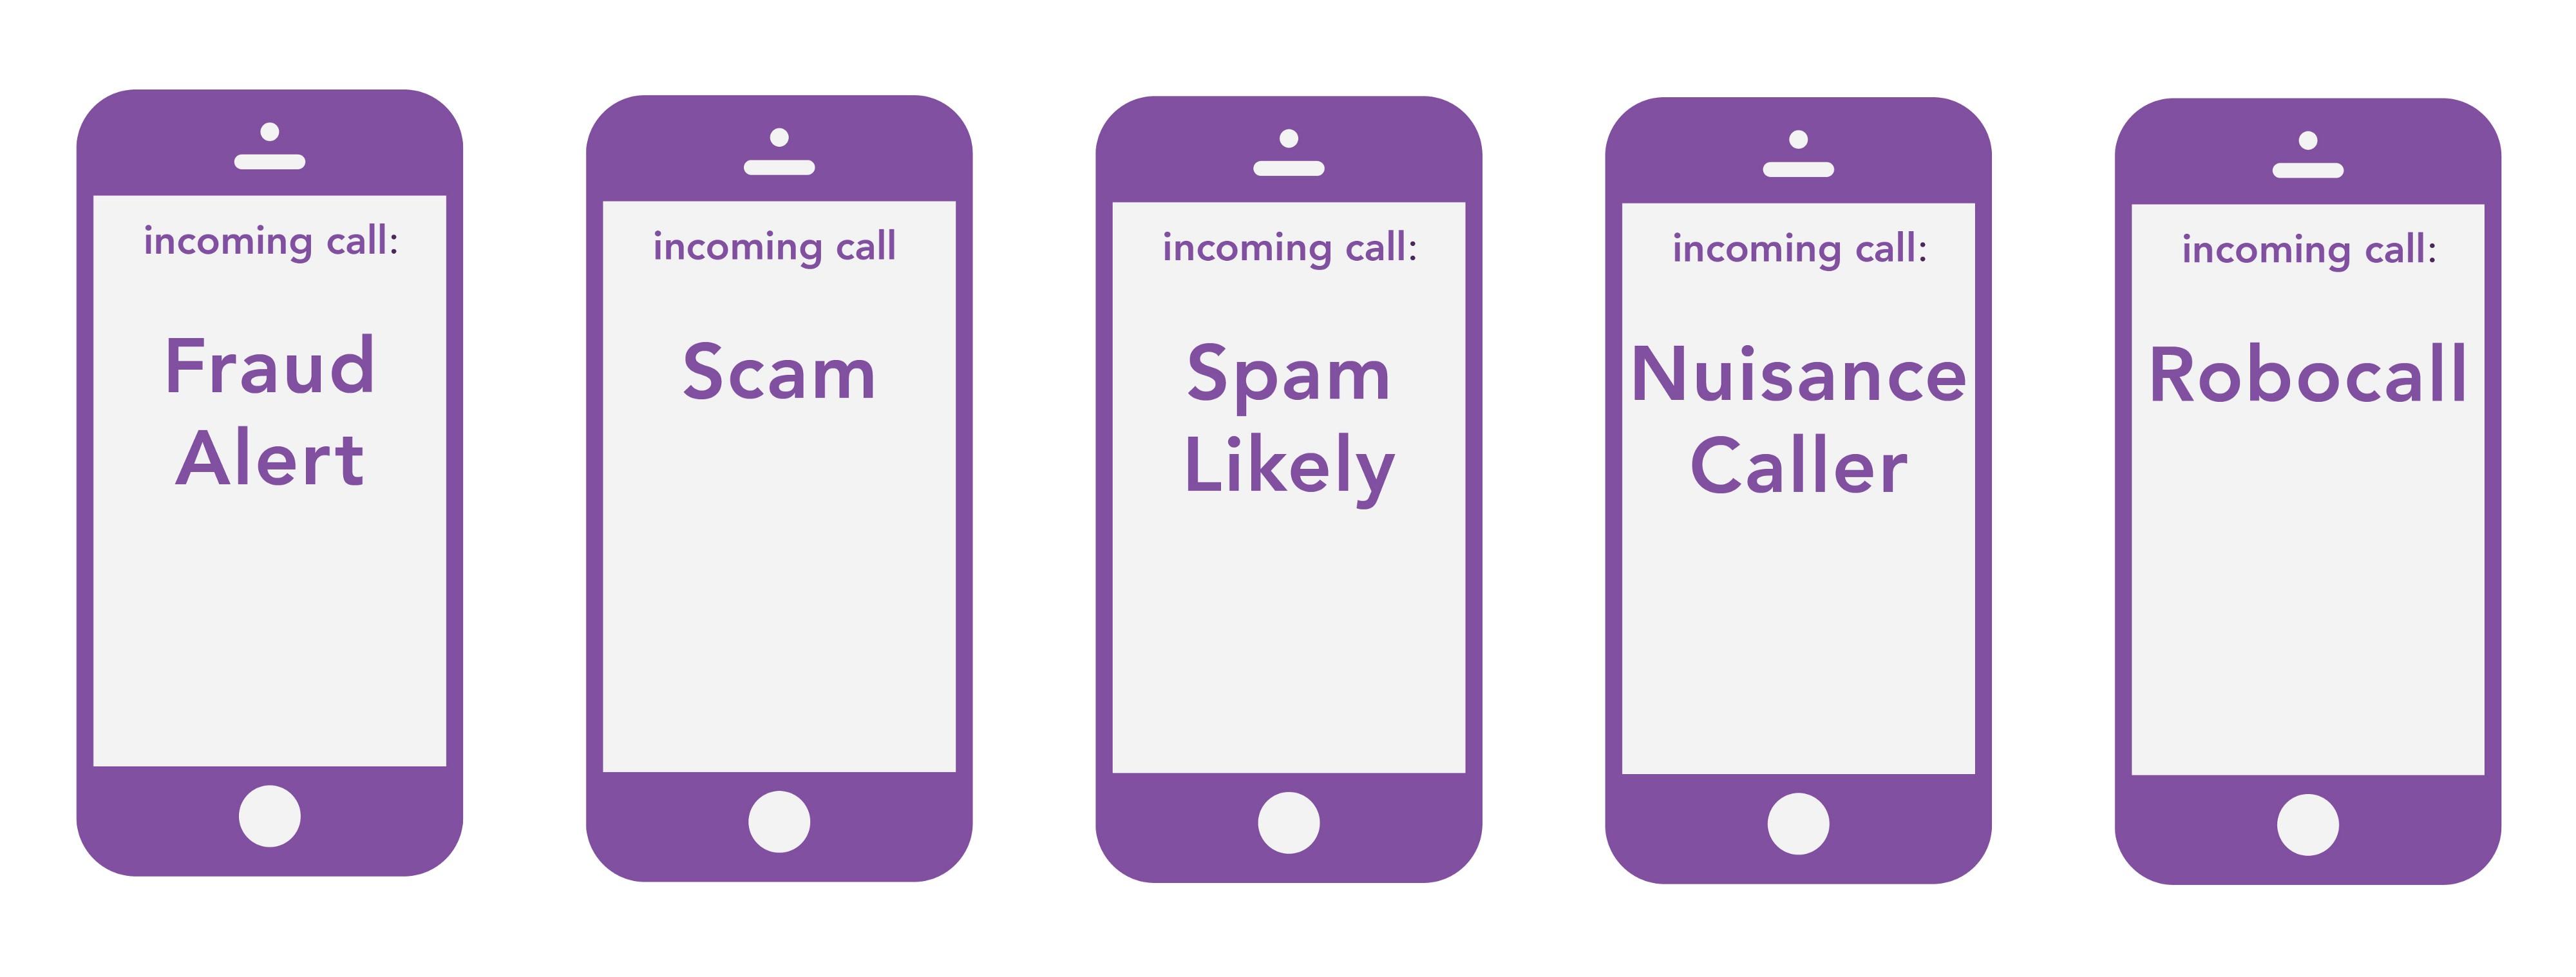 Scam, Fraud Alert, Spam Likely, Nuisance Caller, etc.